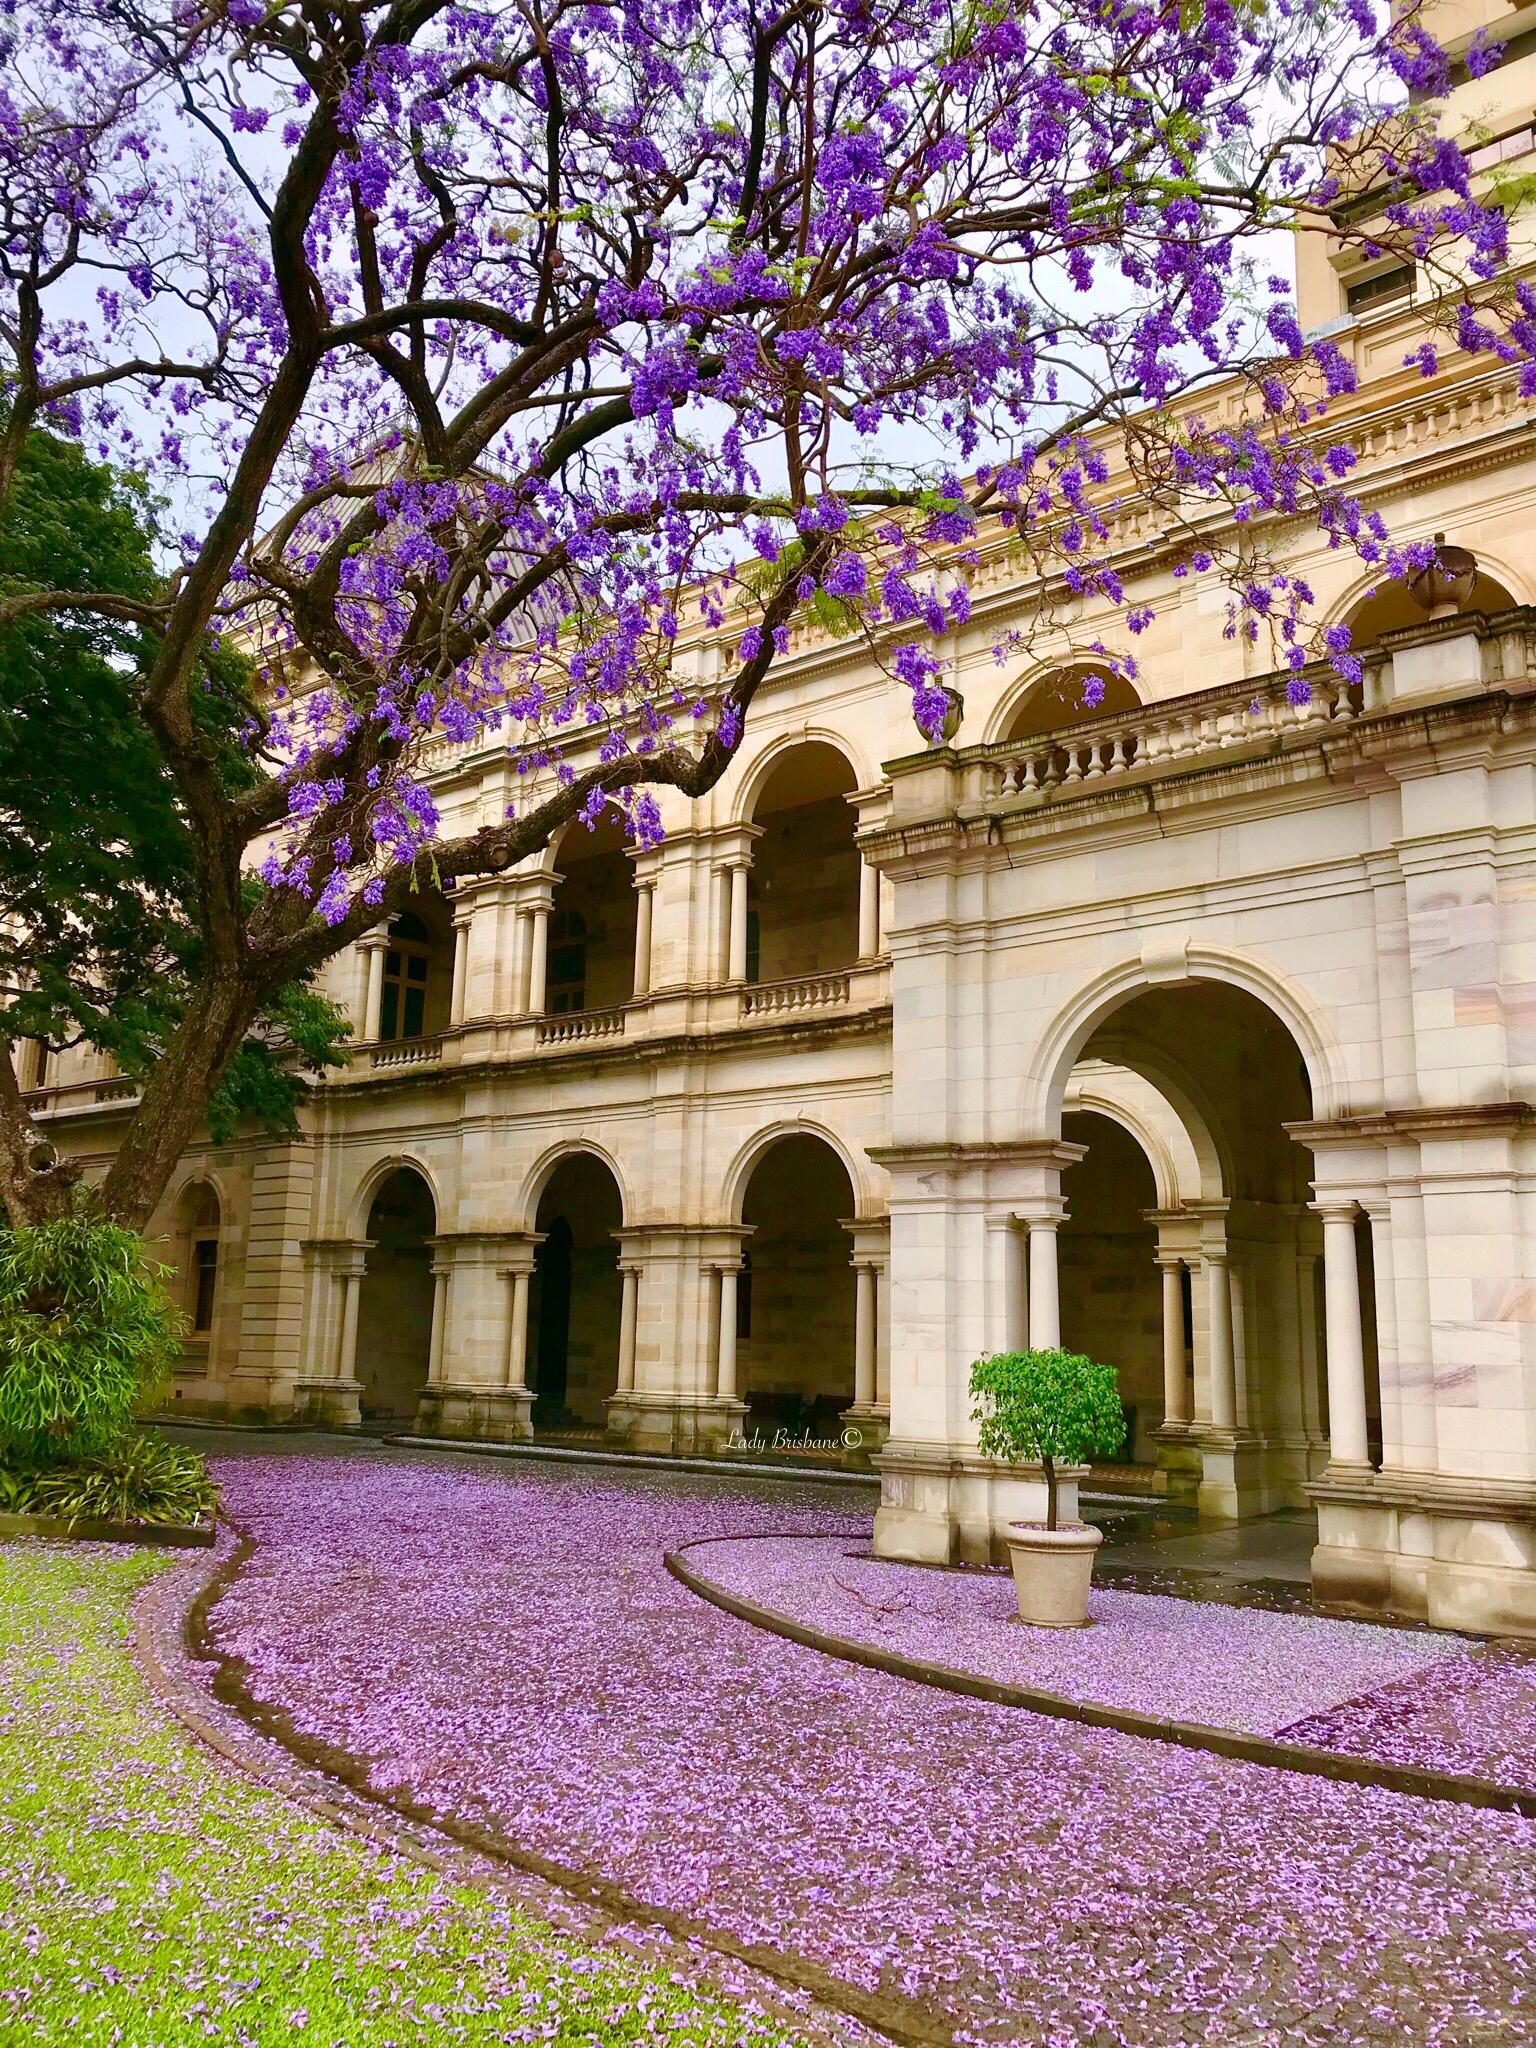 Parliament House, Brisbane.